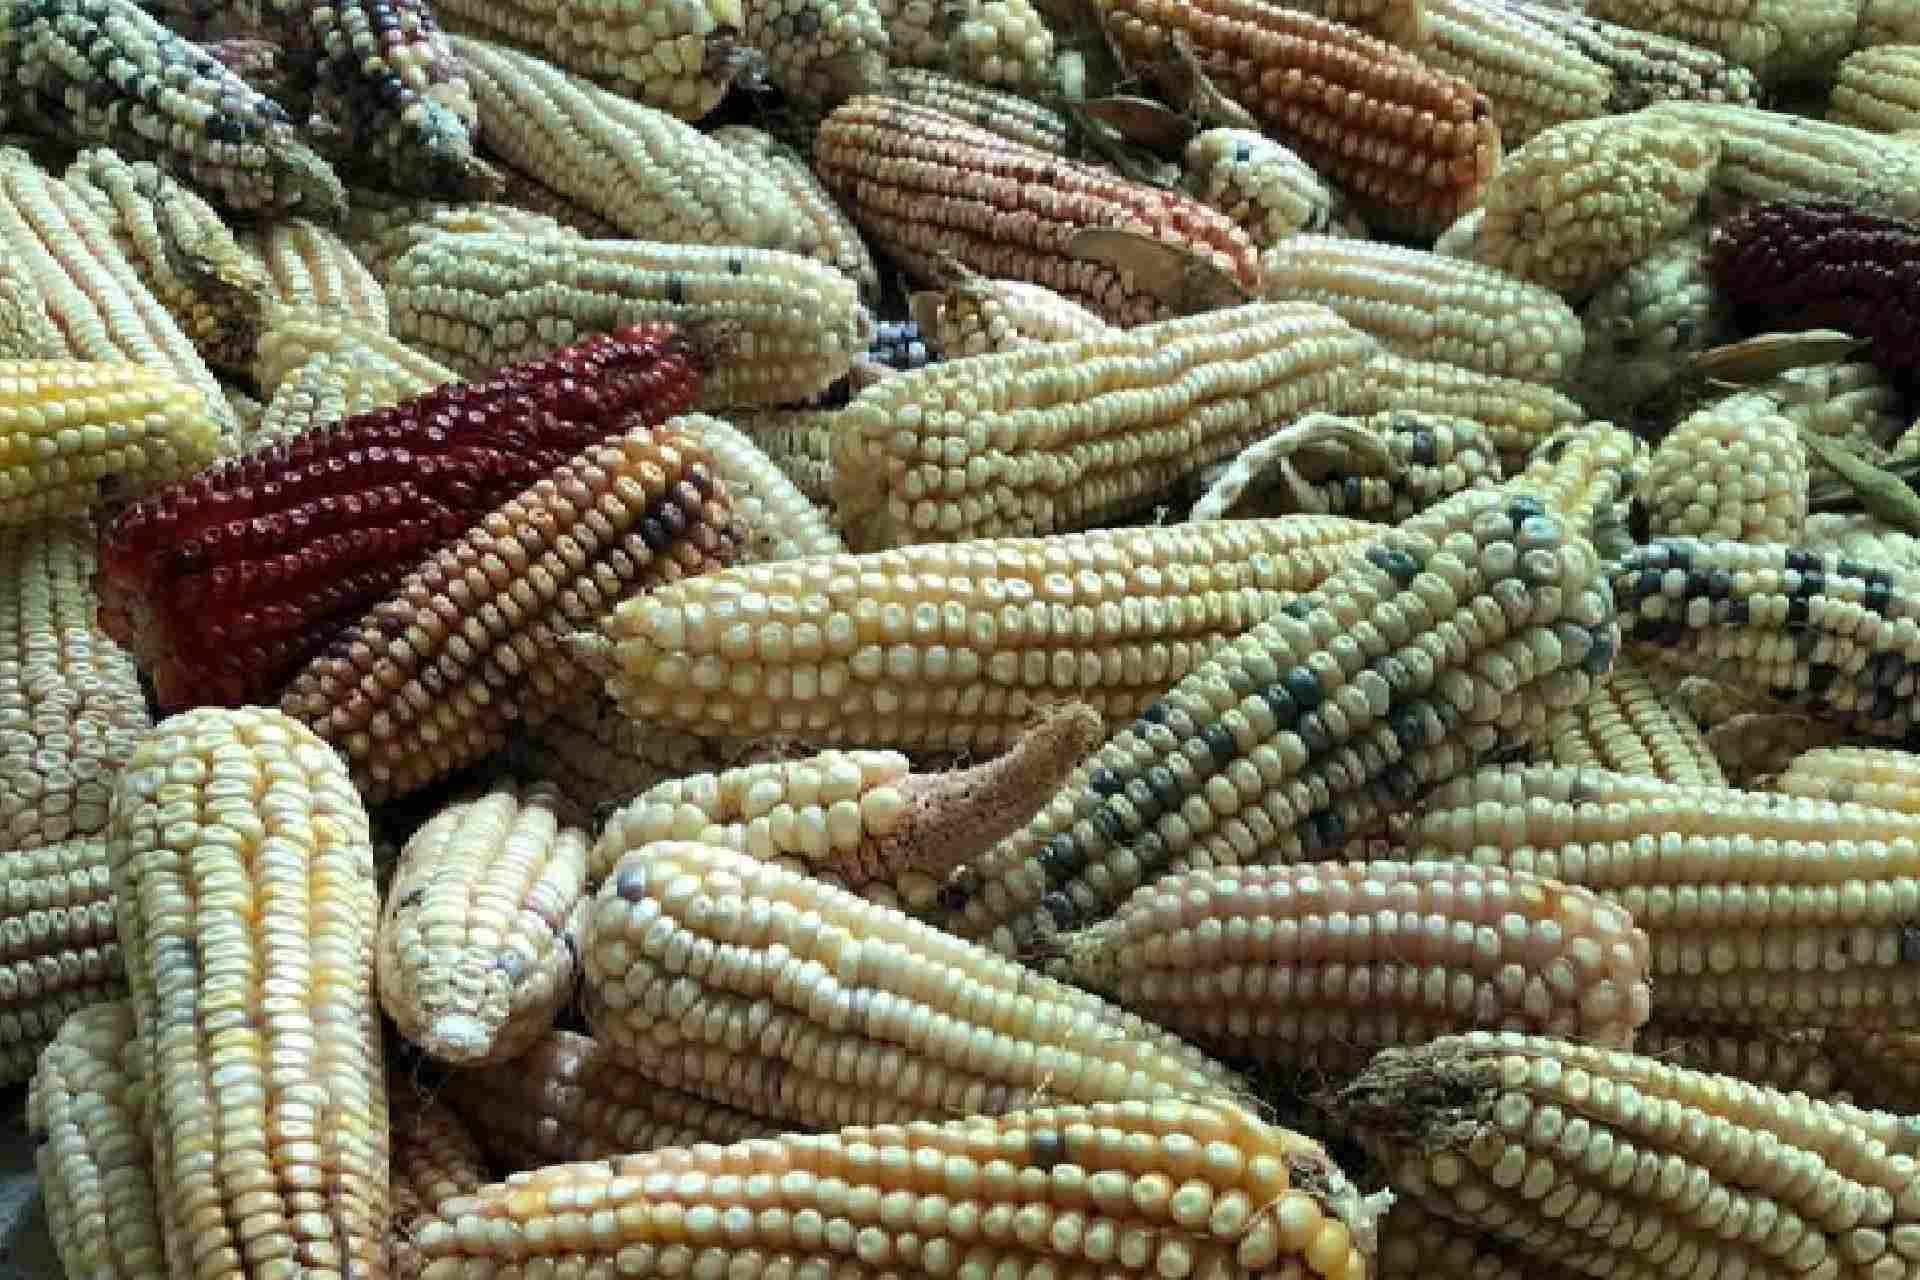 maíz-escenario-tlaxcala-mexico-covid-19-produccion